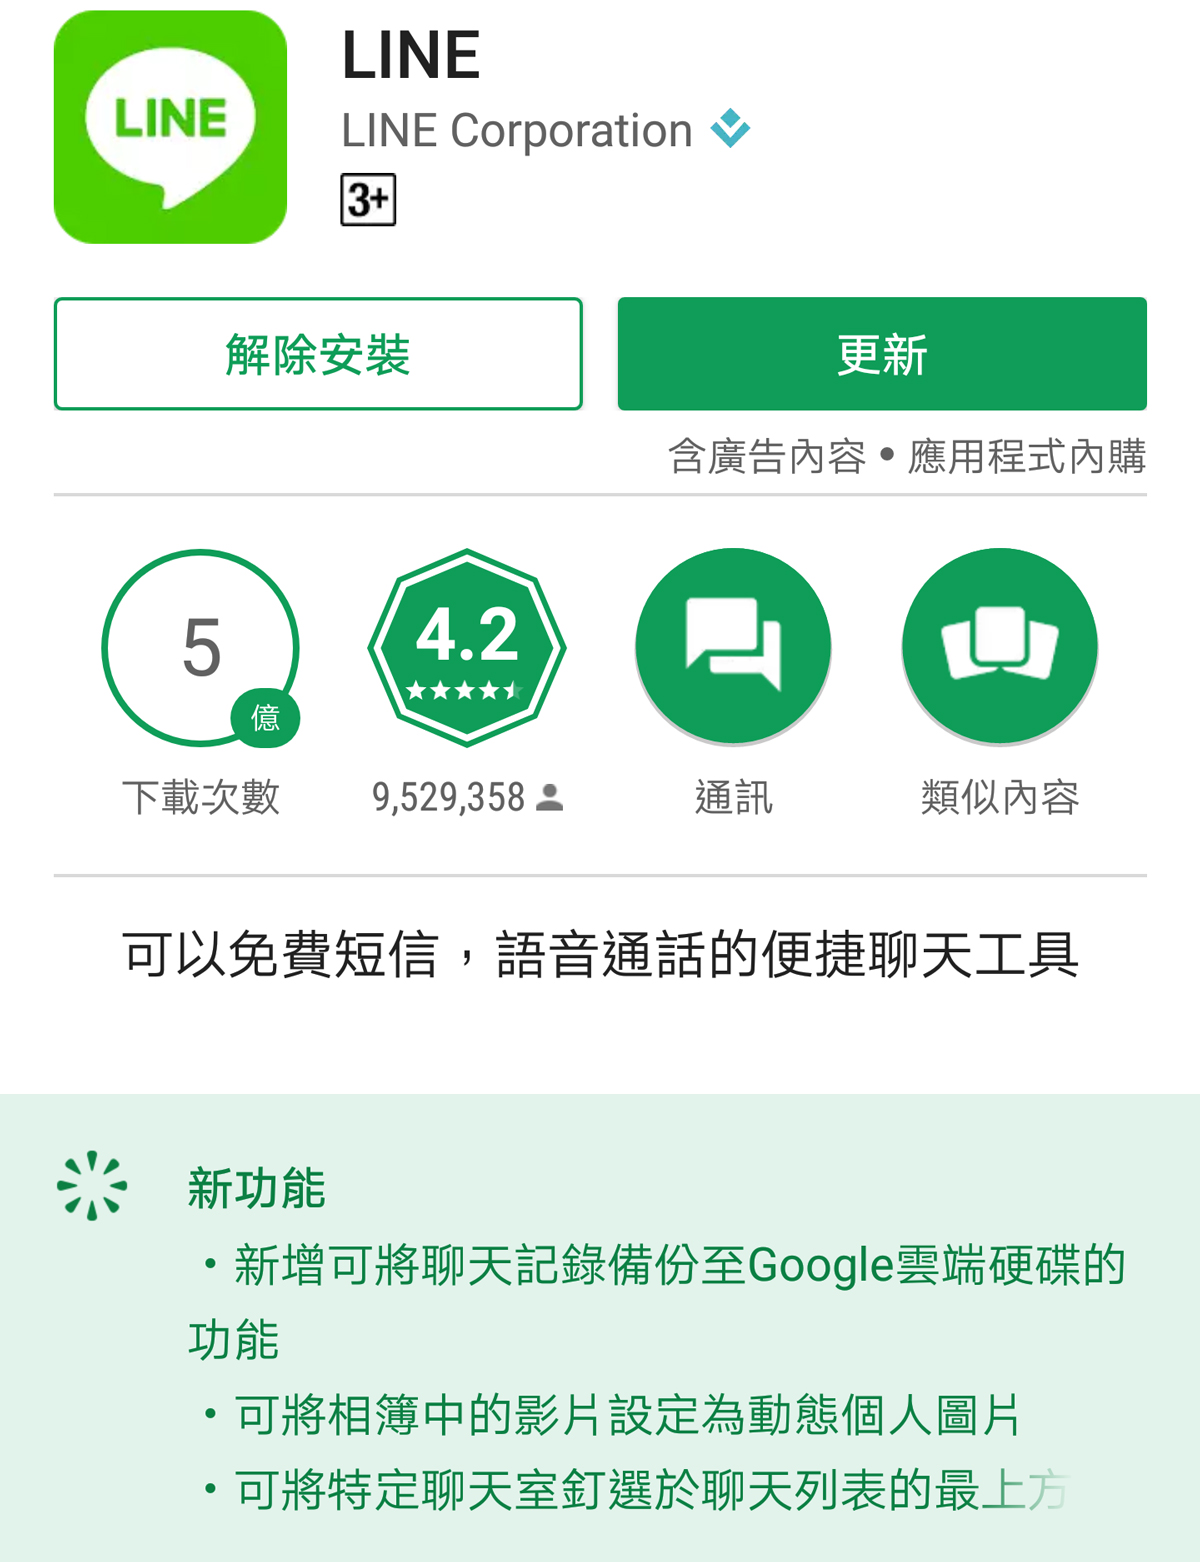 LINE Android 7.5版新增聊天記錄備份還原機制!手機更換後不用再擔心LINE聊天記錄該如何轉移了 - 傳說中的挨踢部門